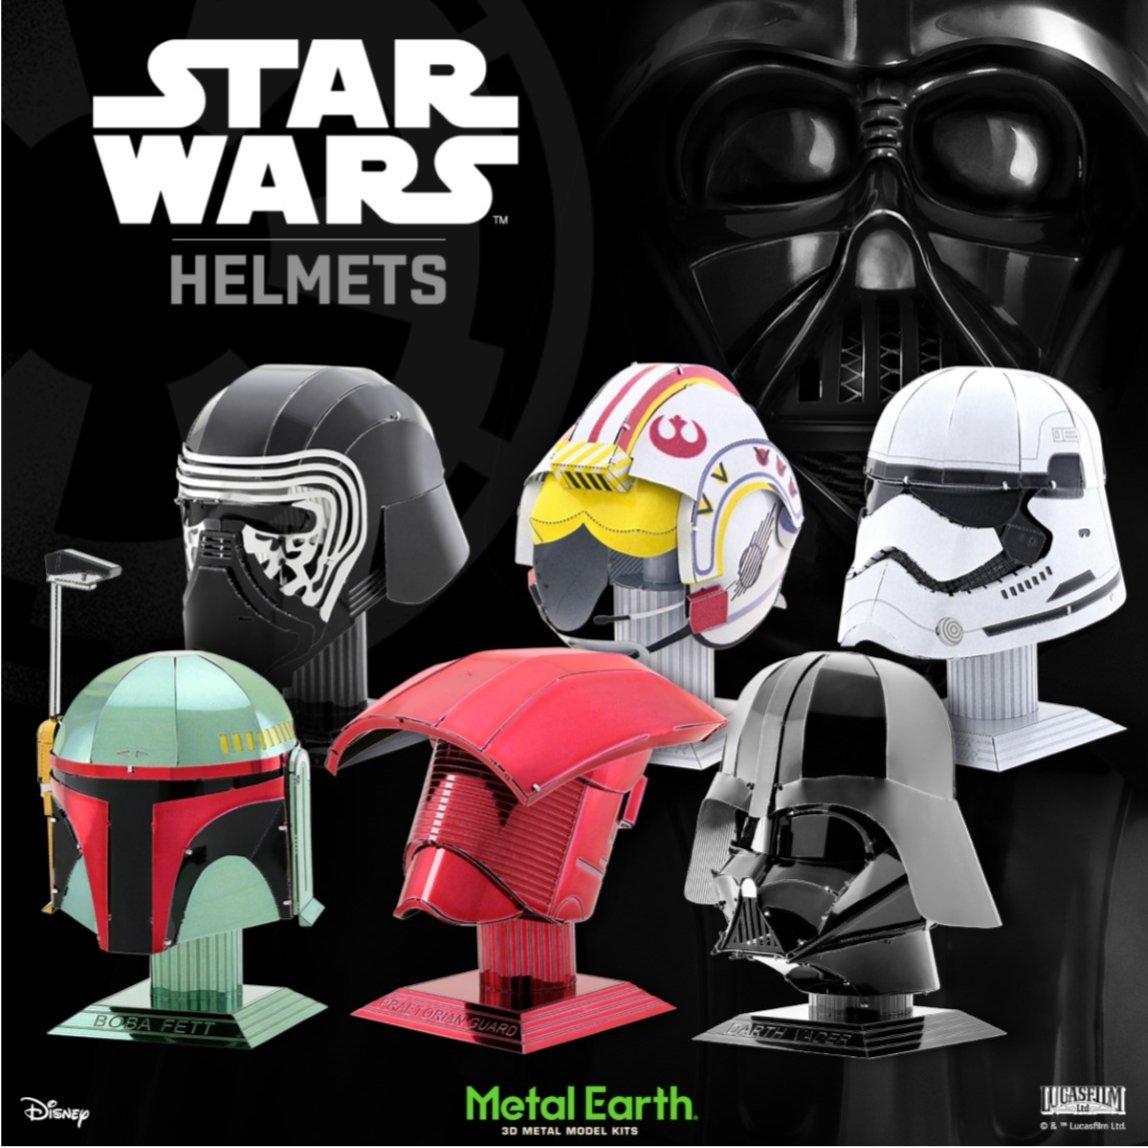 d16861aac  Starwars  MetalEarth giveaway!  Win Complete set of SW Helmets Metal Earth  models from  MetalEarth3D !  metalearth  Giveaway  DwilightF66   JohnnieBowers47 ...